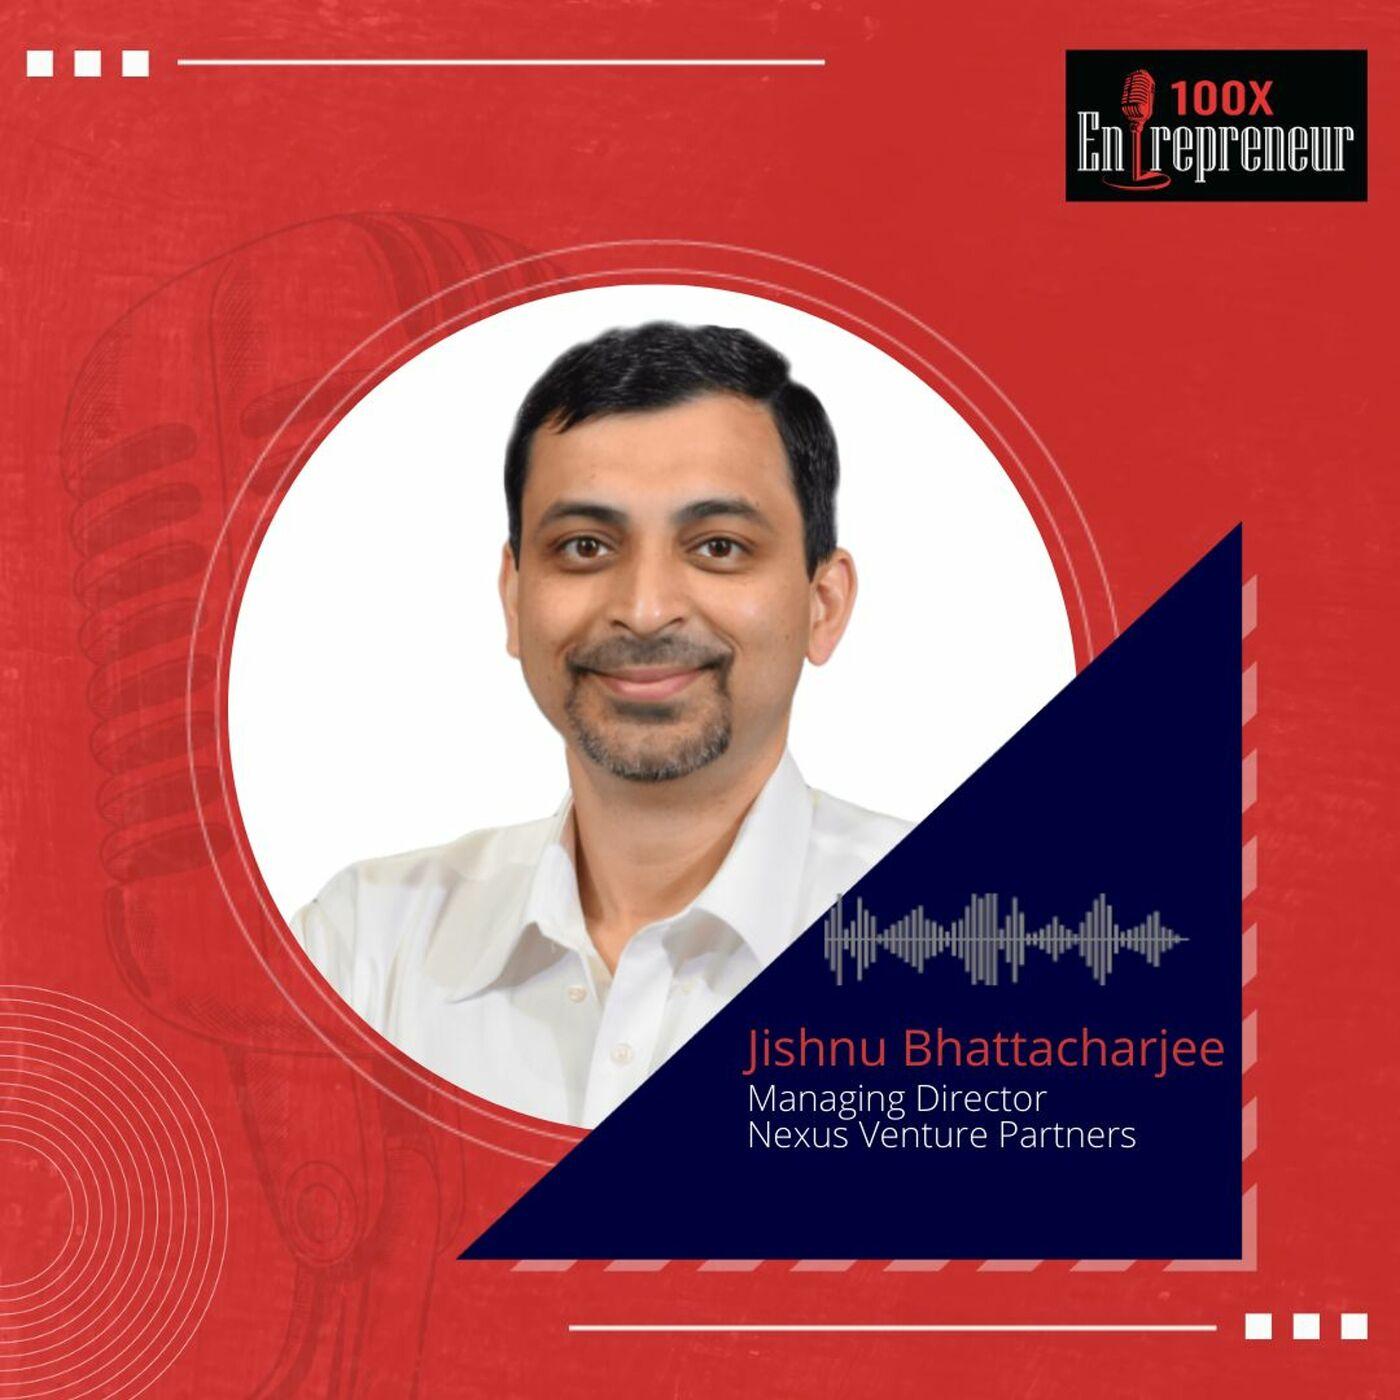 Jishnu Bhattacharjee, Managing Director, Nexus VP on the success recipe of Druva and Postman